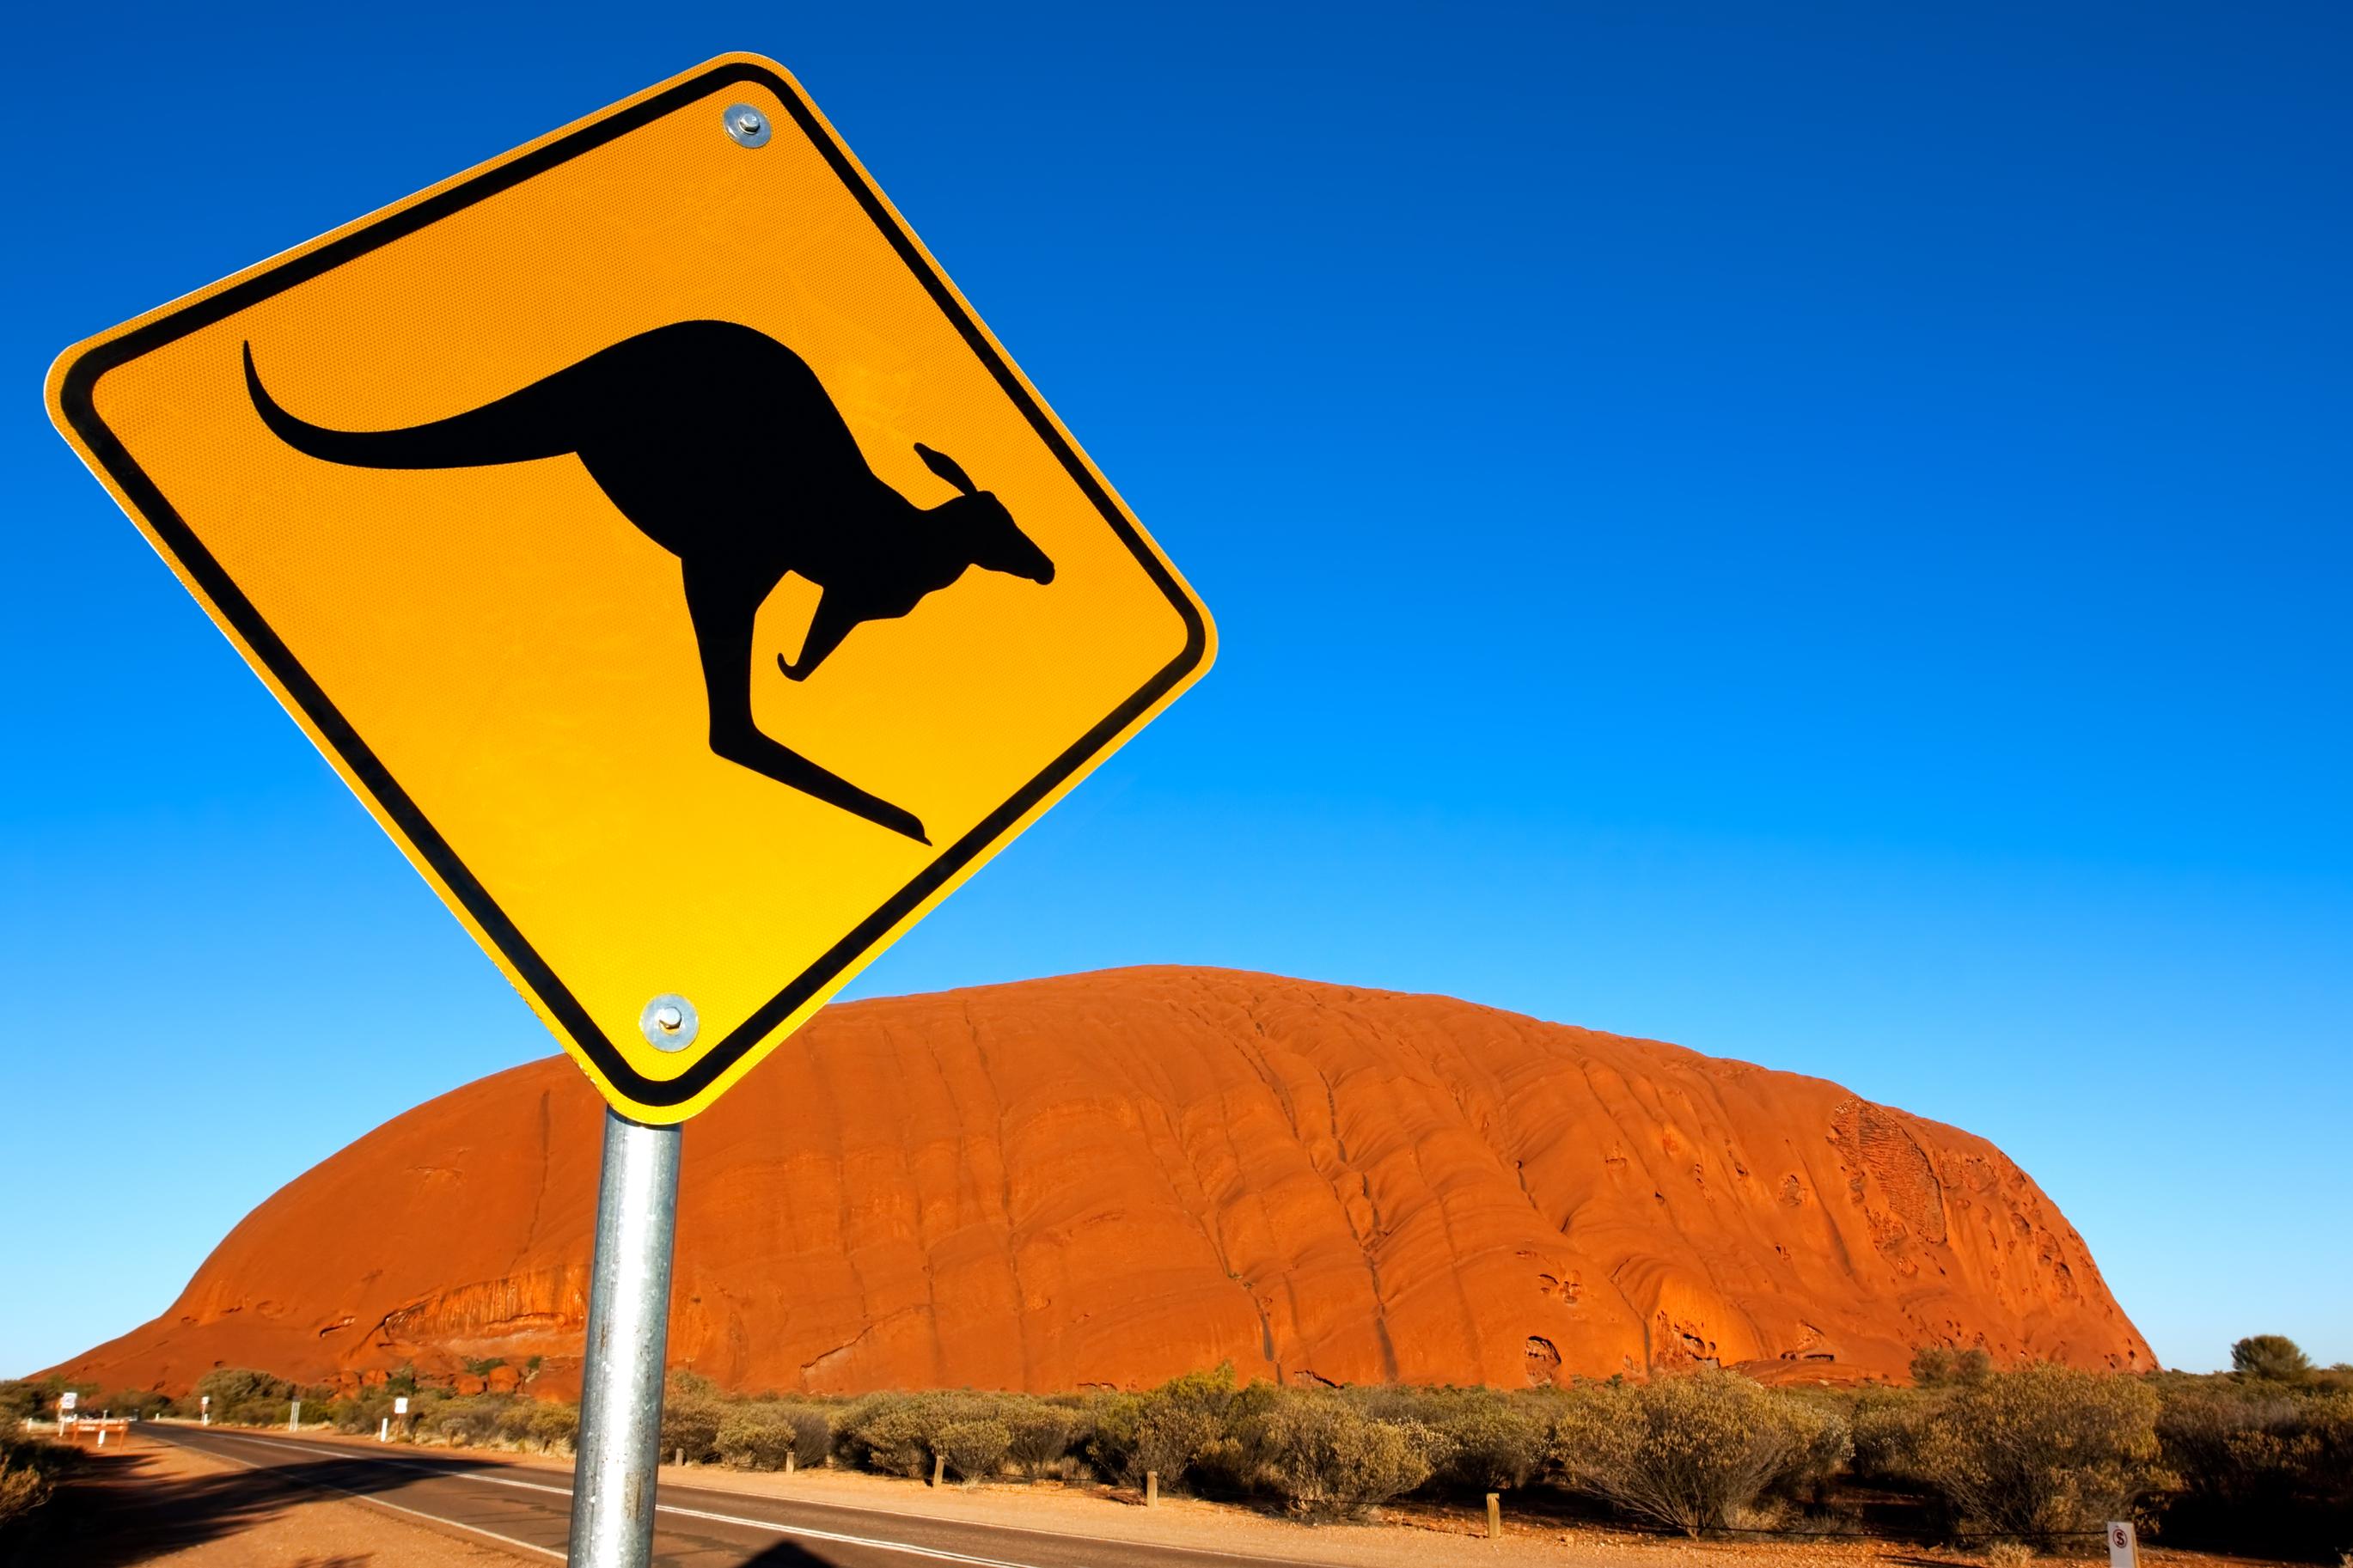 Kangaroo sign with Uluru in the background.